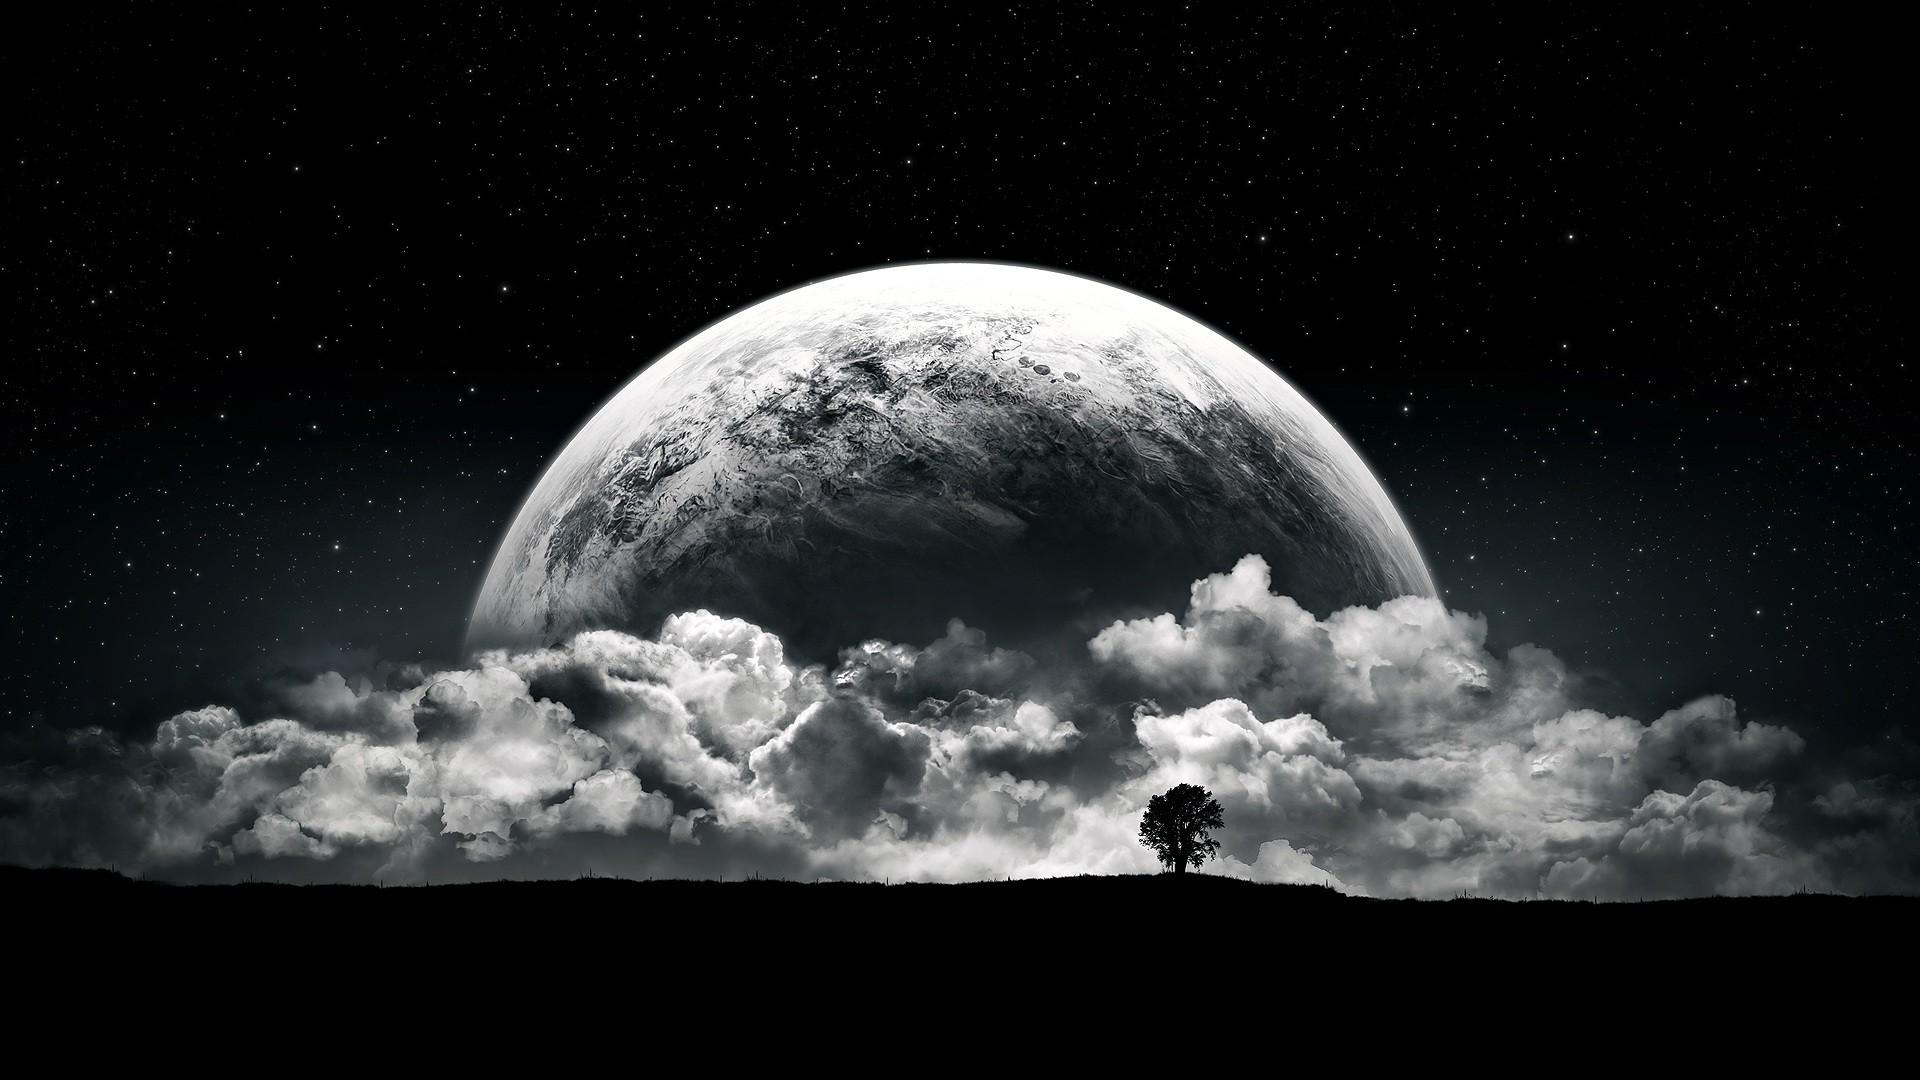 wallpaper : 1920x1080 px, black, clouds, moon, night, planet, stars